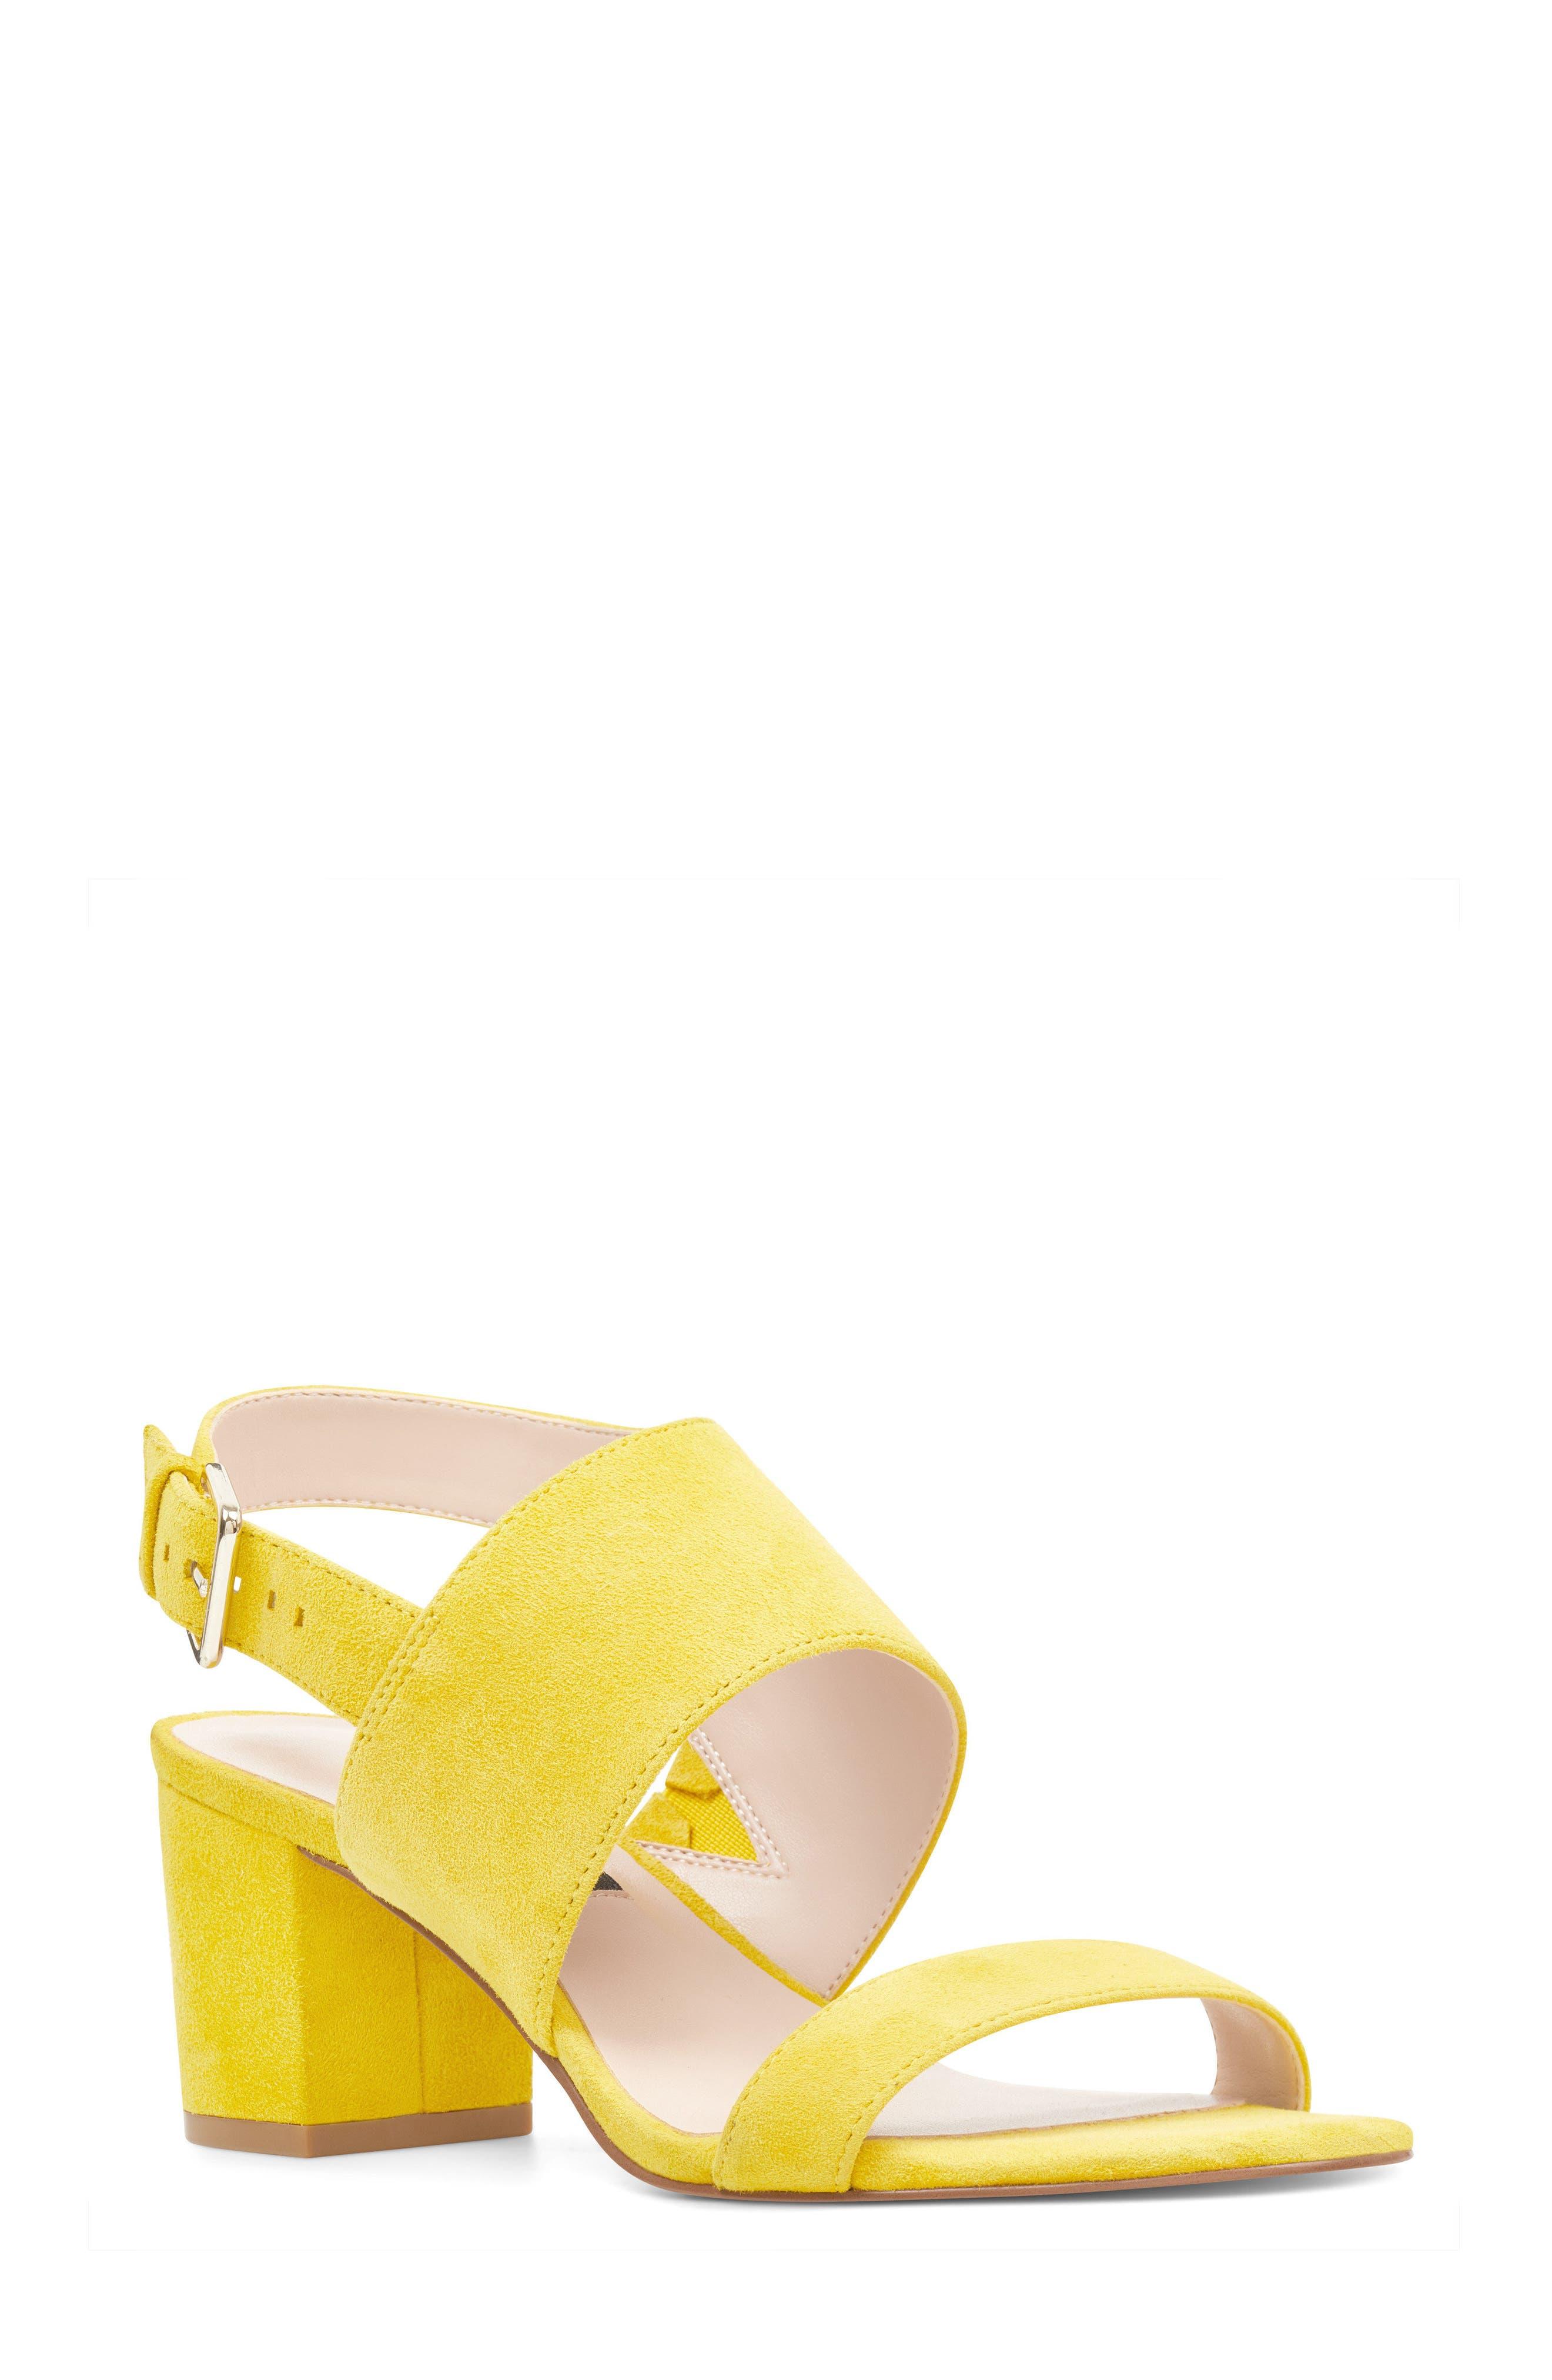 Forli Asymmetrical Sandal,                             Main thumbnail 1, color,                             Yellow Suede